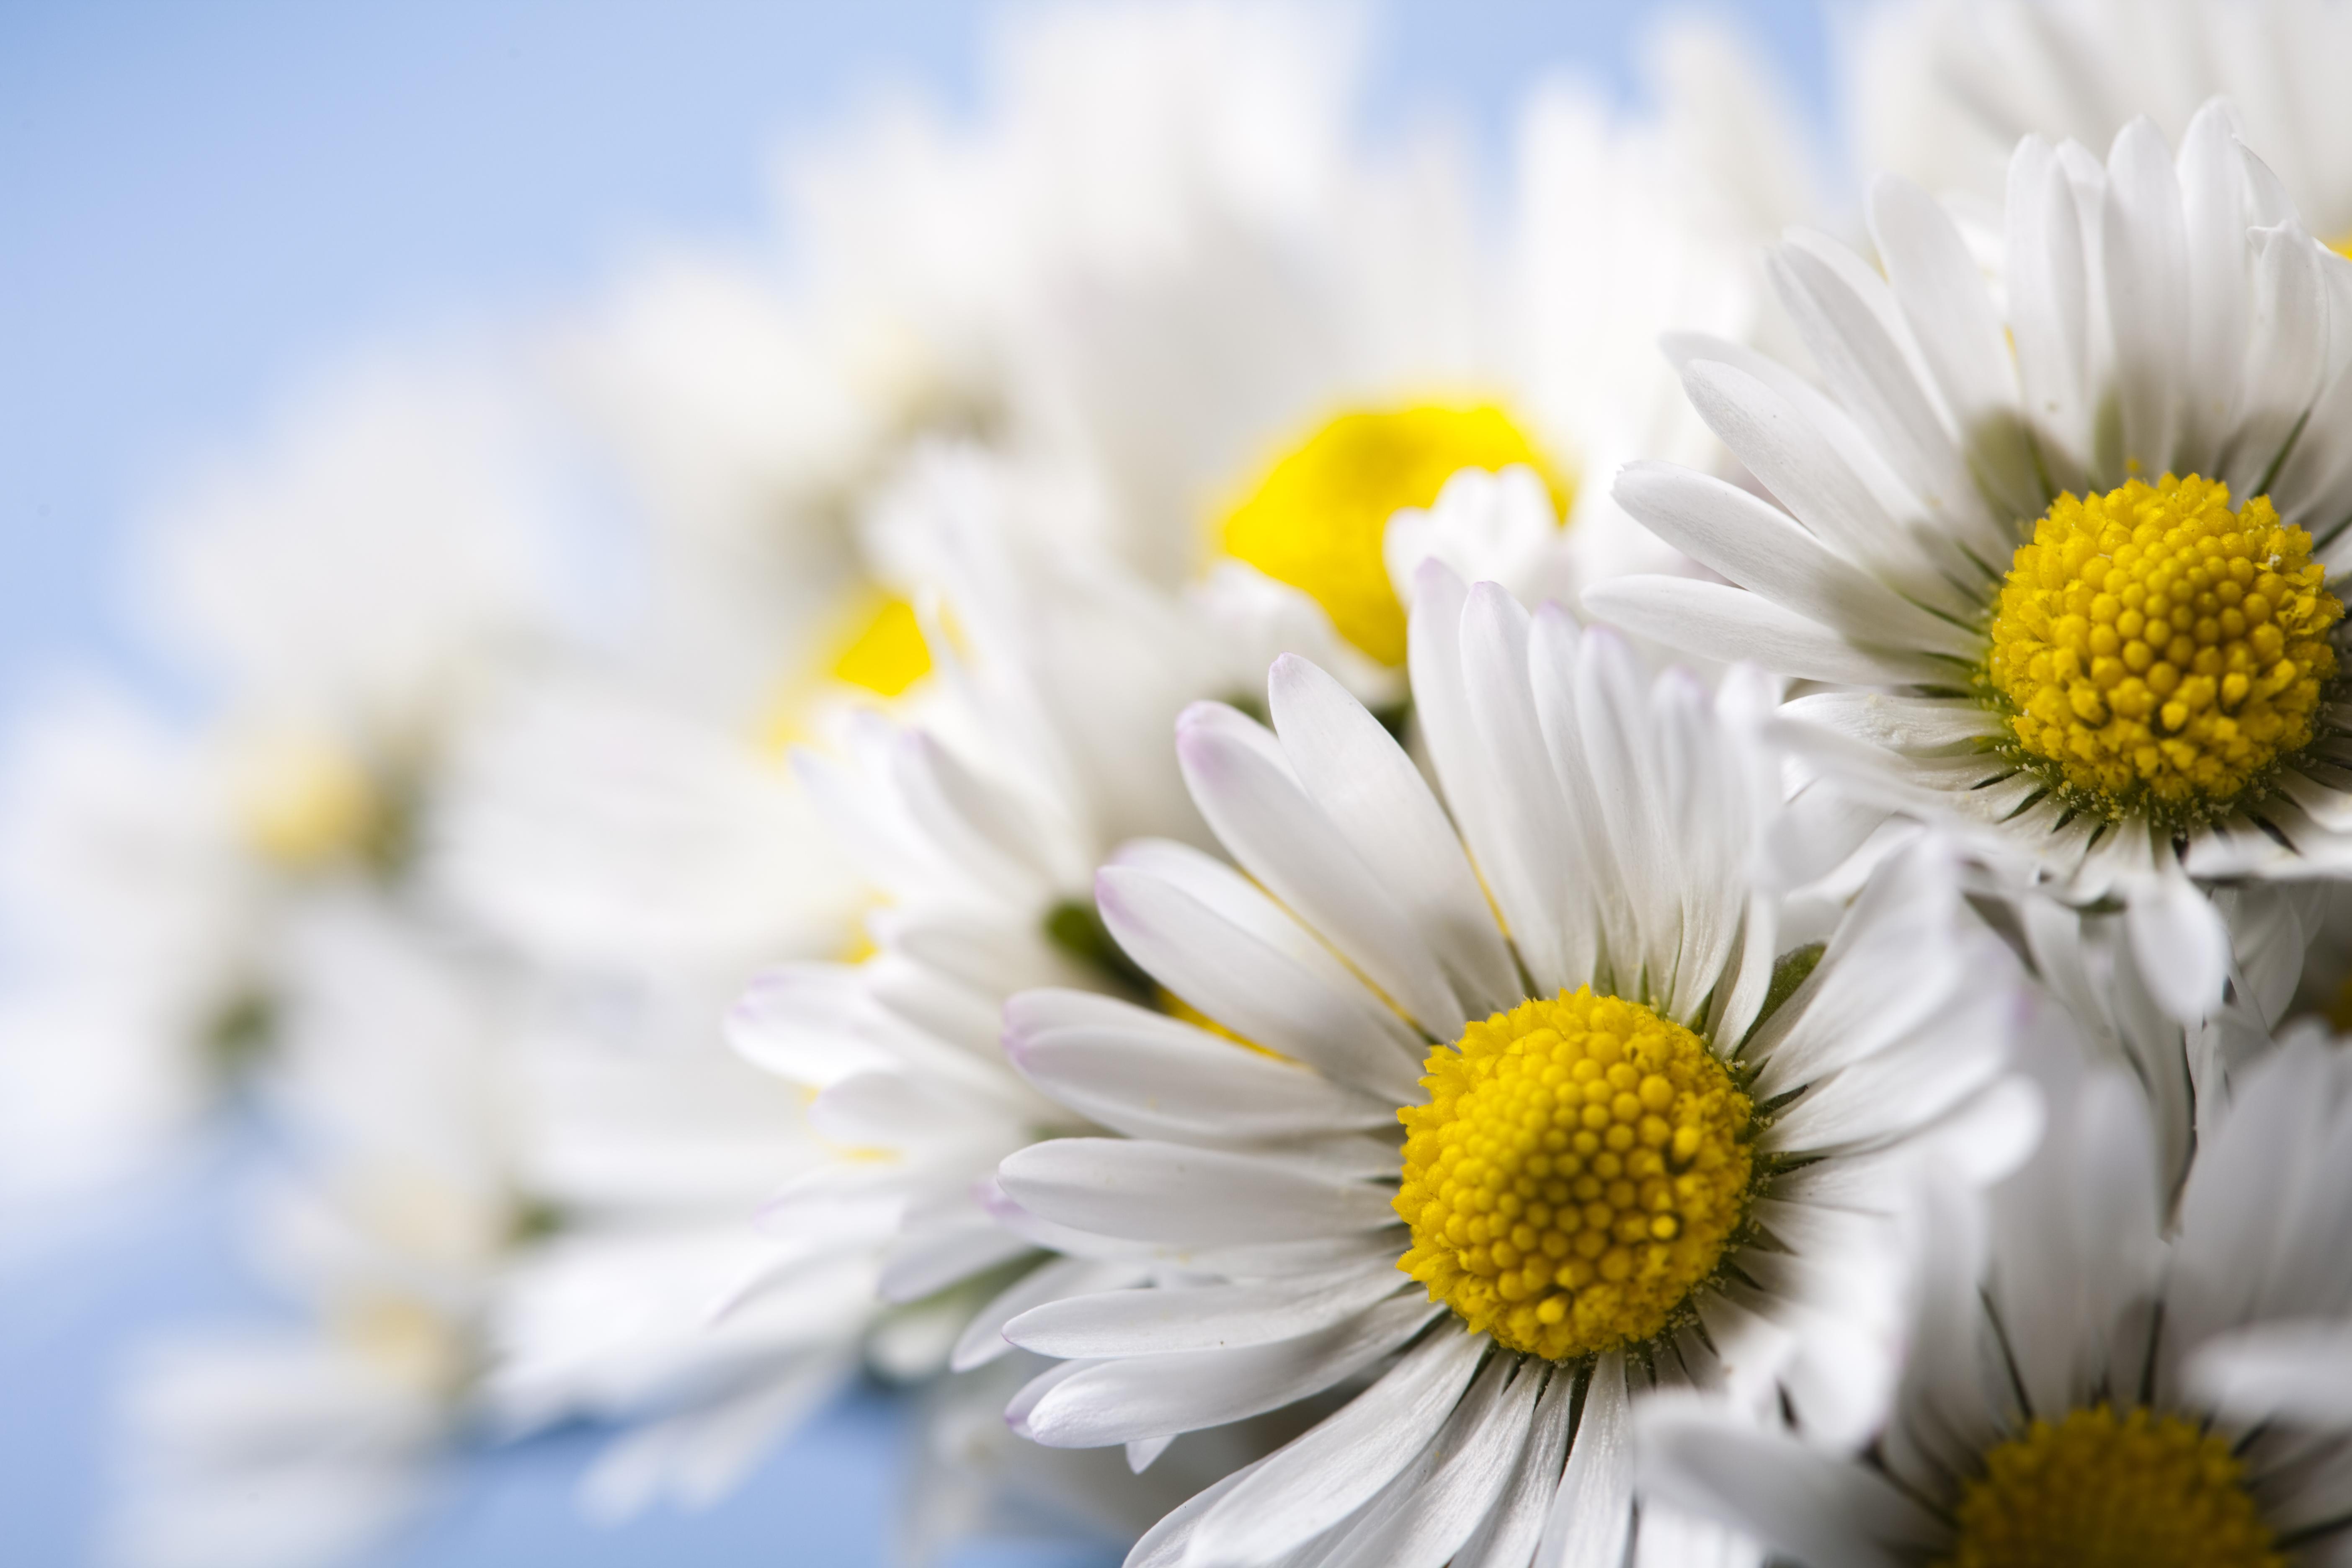 Find your birth month flower daisy flower springtime bright vivid theme izmirmasajfo